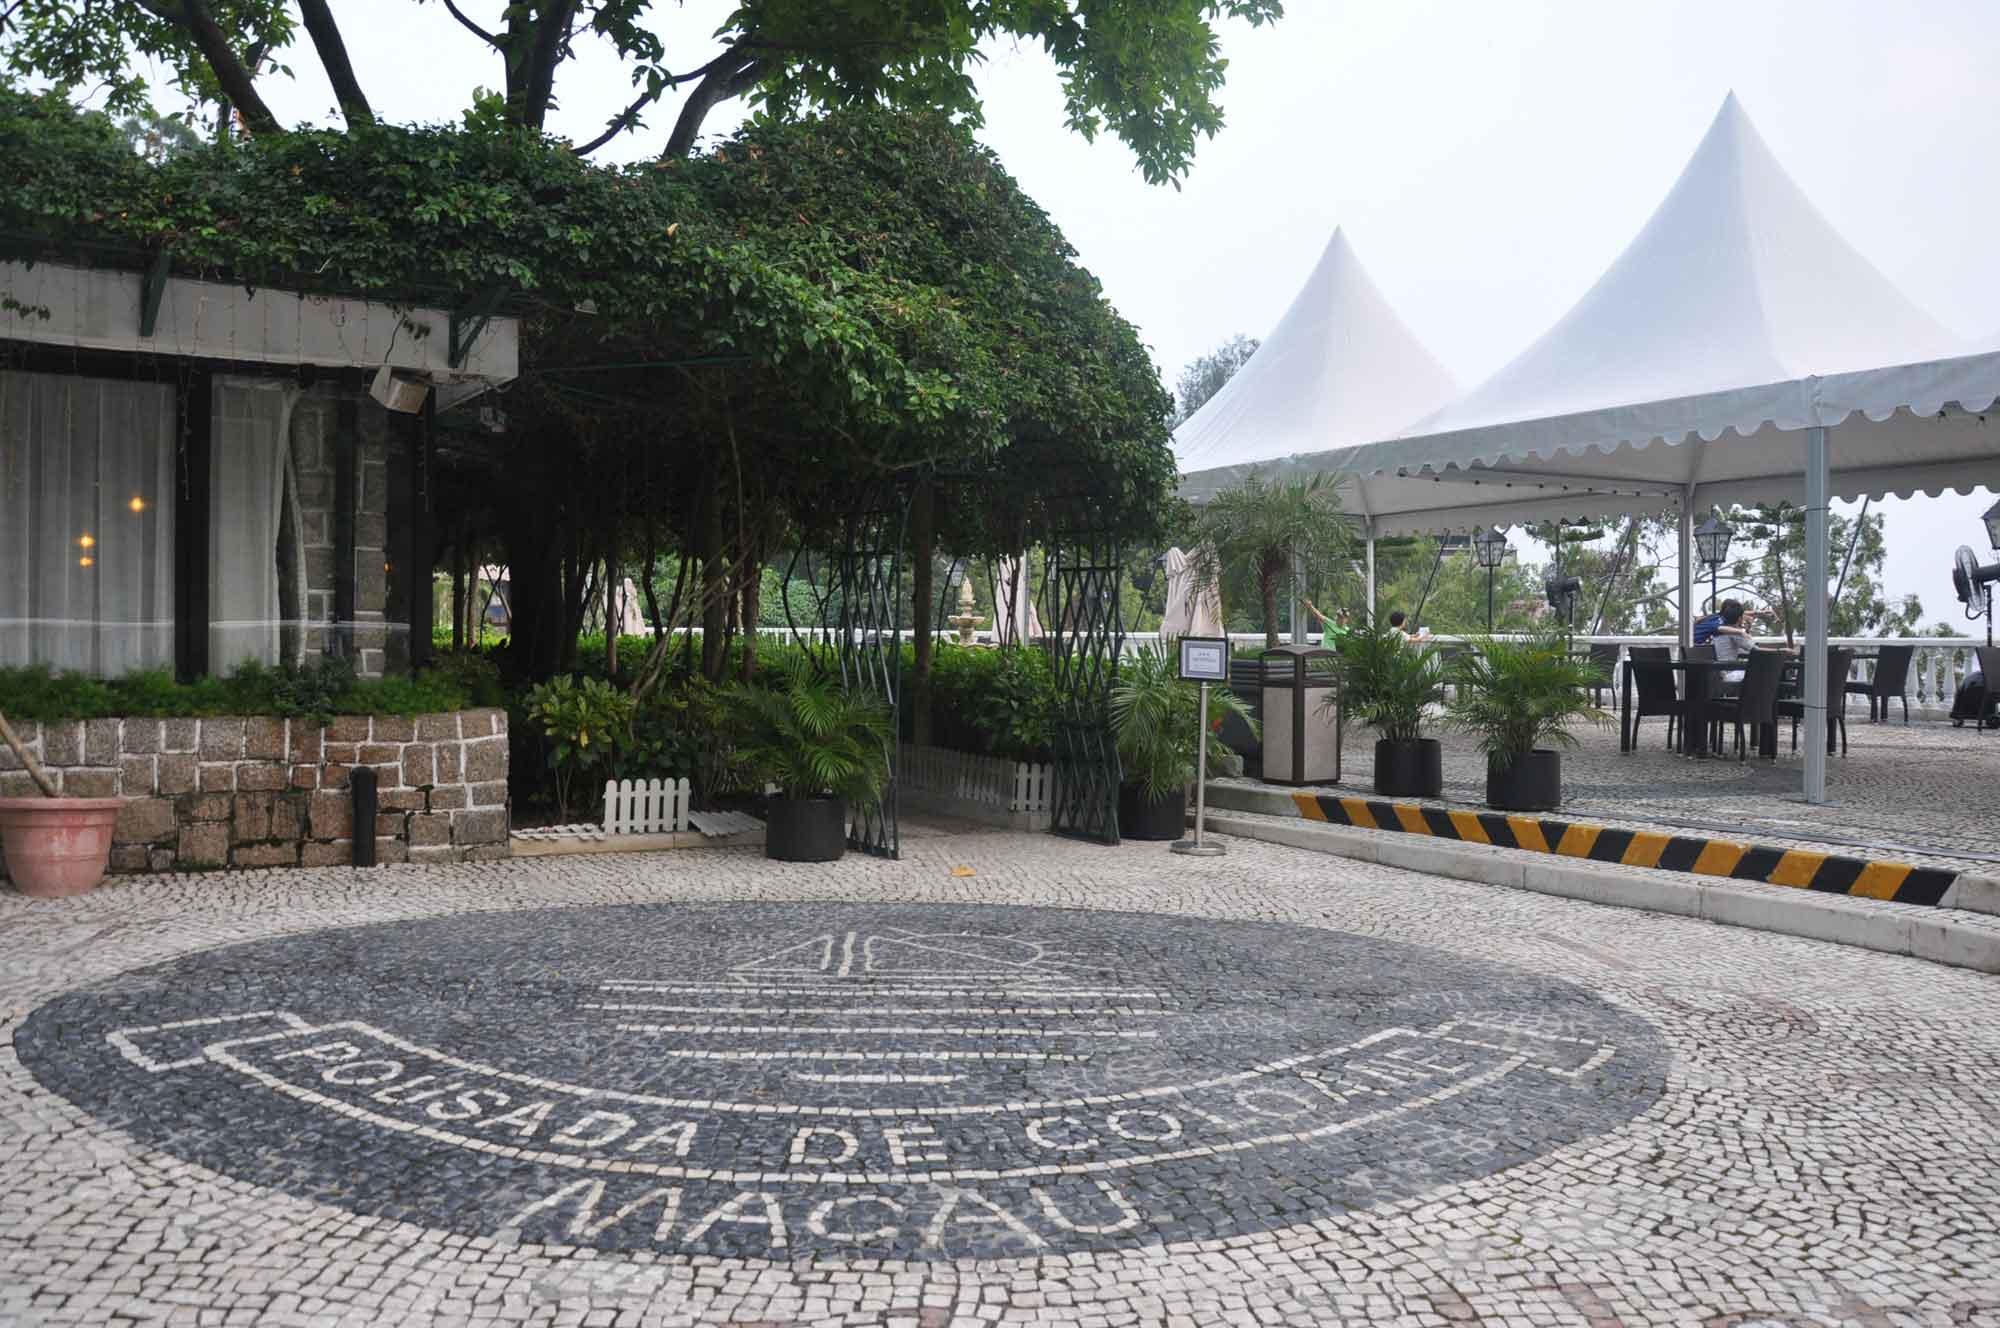 Pousada de Coloane Macau